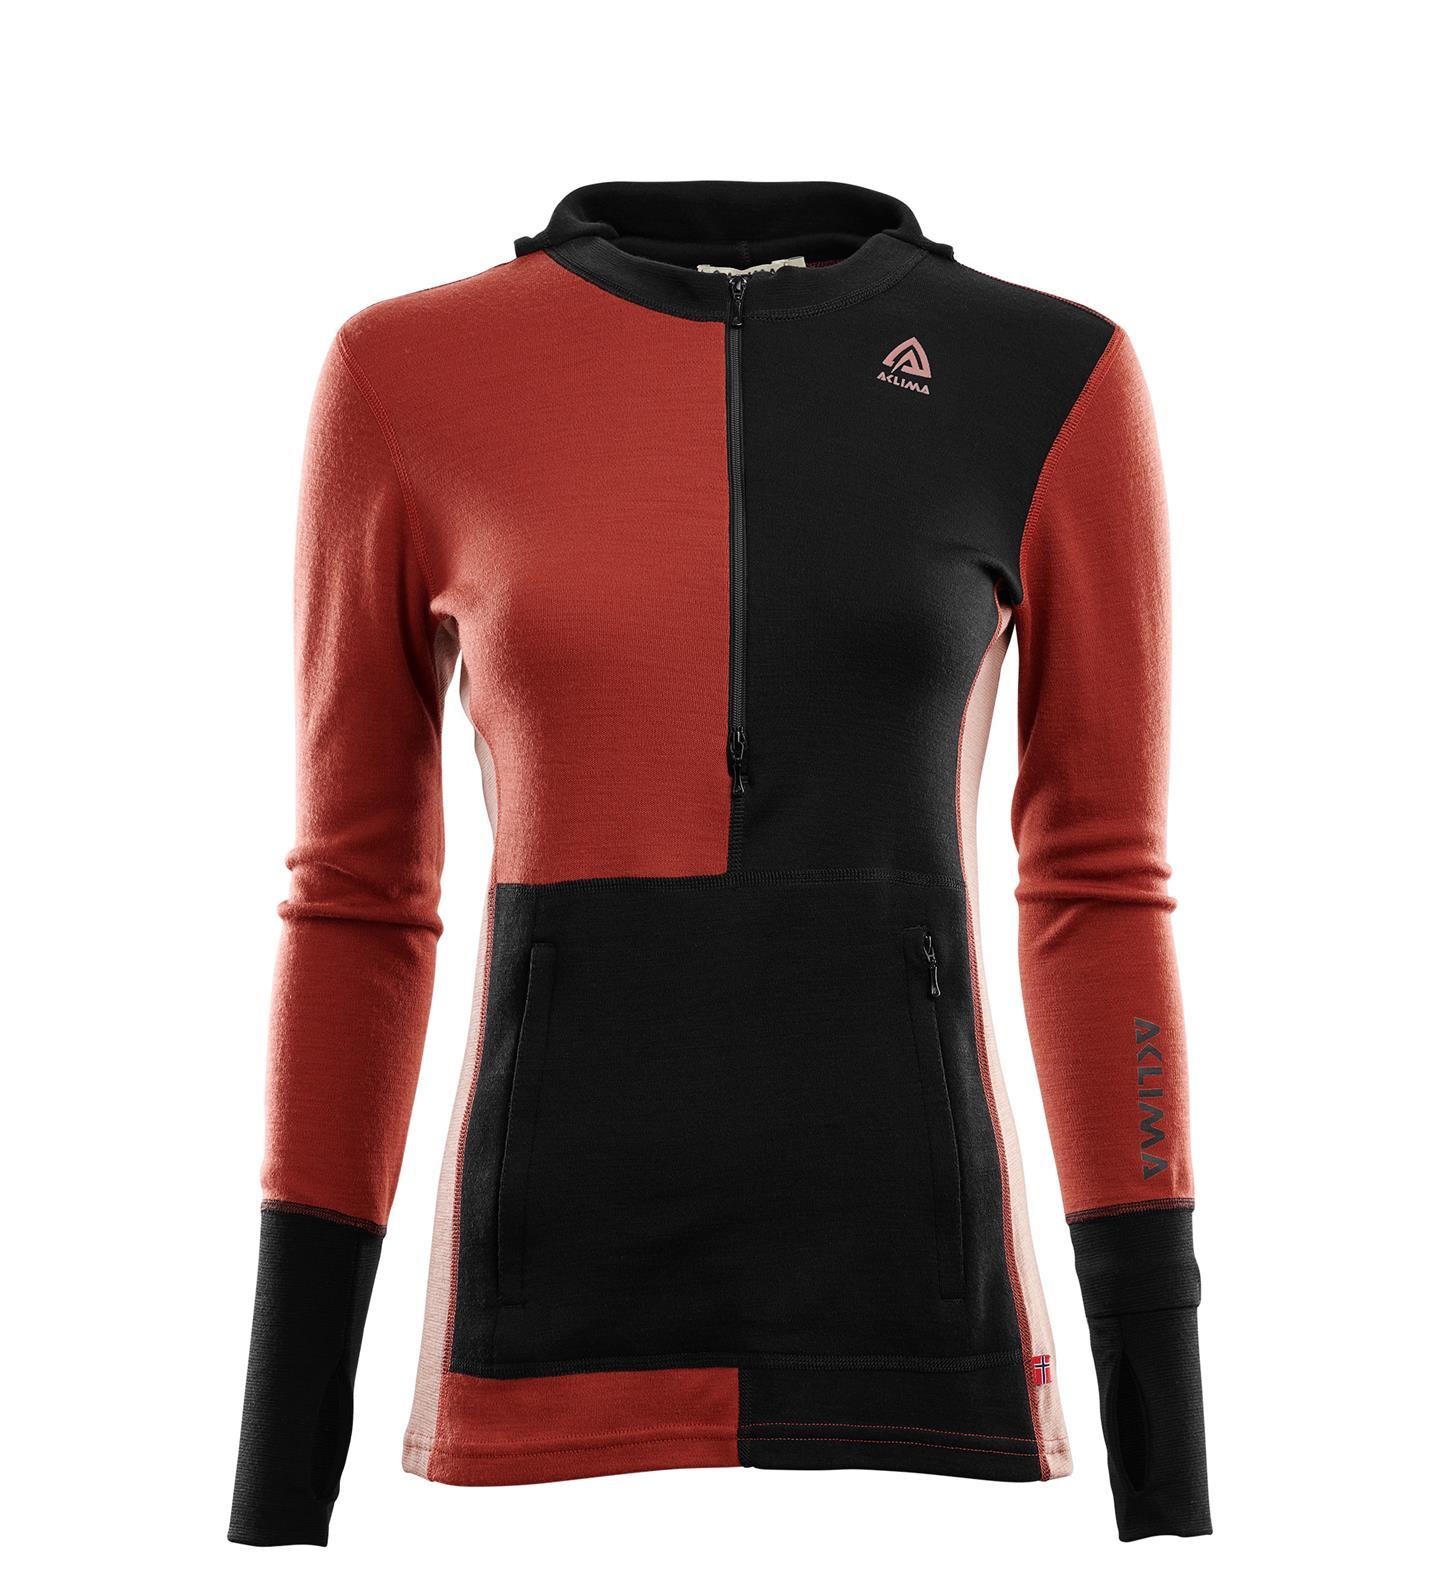 Aclima Warmwool Hooded Sweater w/zip Dam Jet Black / Red Ochre / Cognac